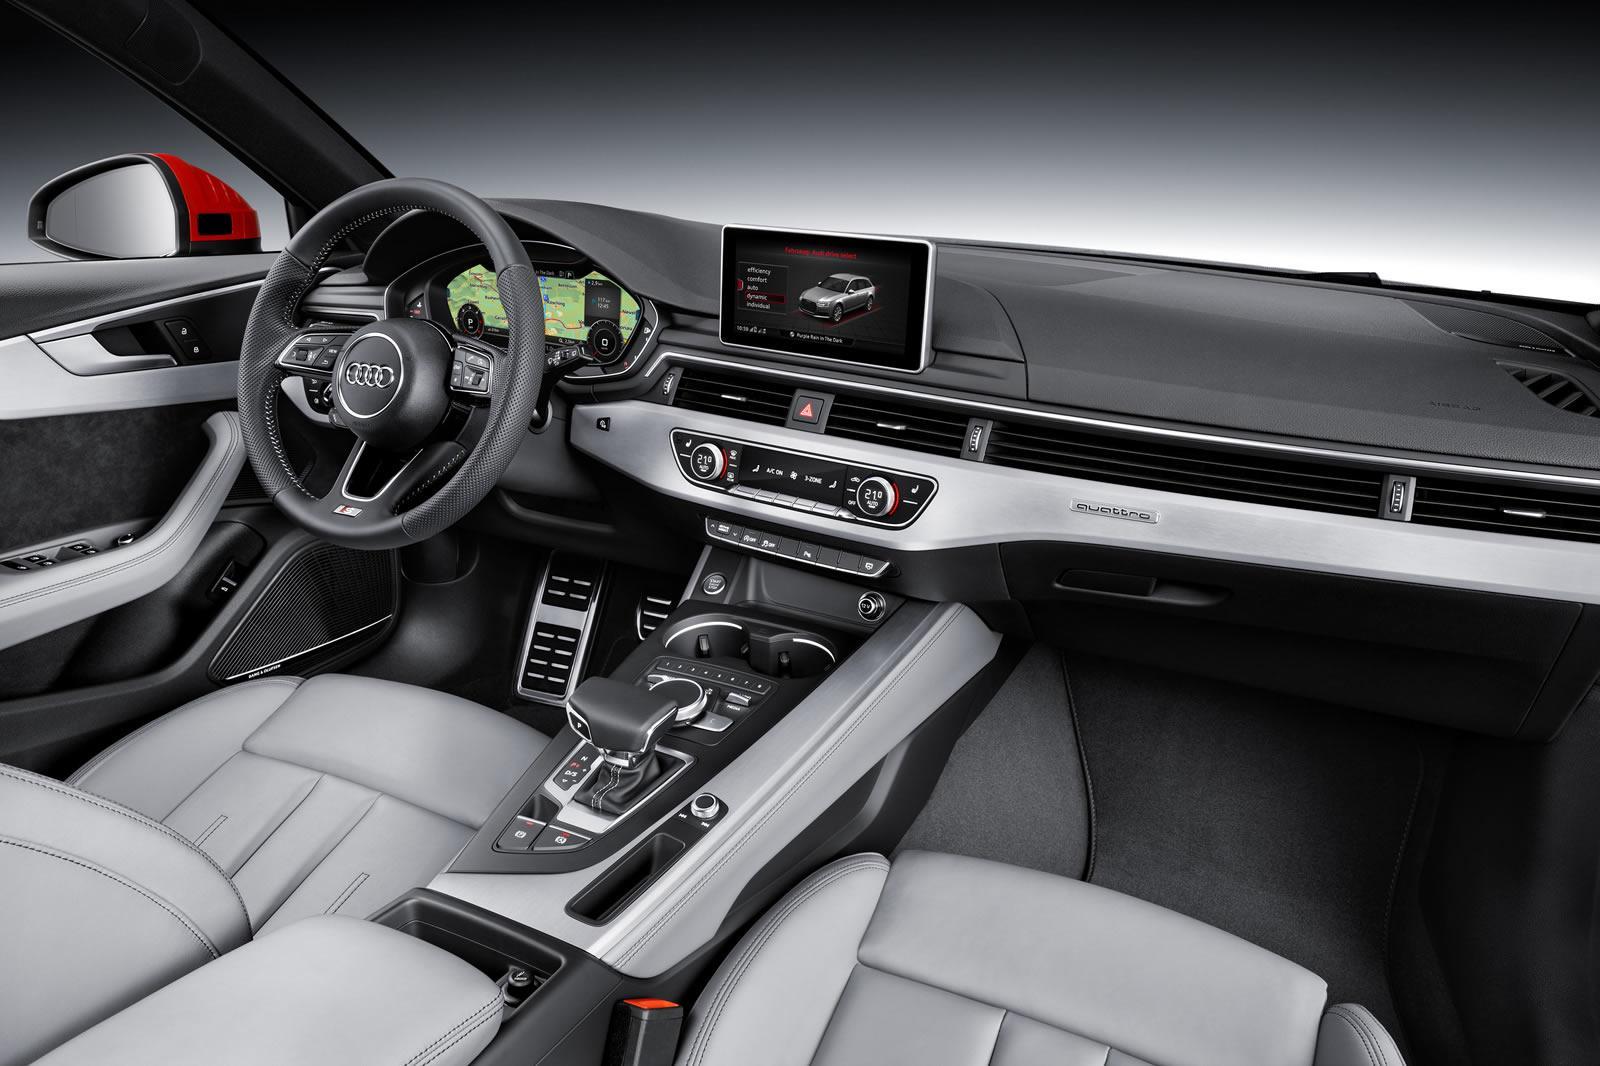 2016 Audi A4 Avant (B9) Photos, Videos and Details Revealed ...